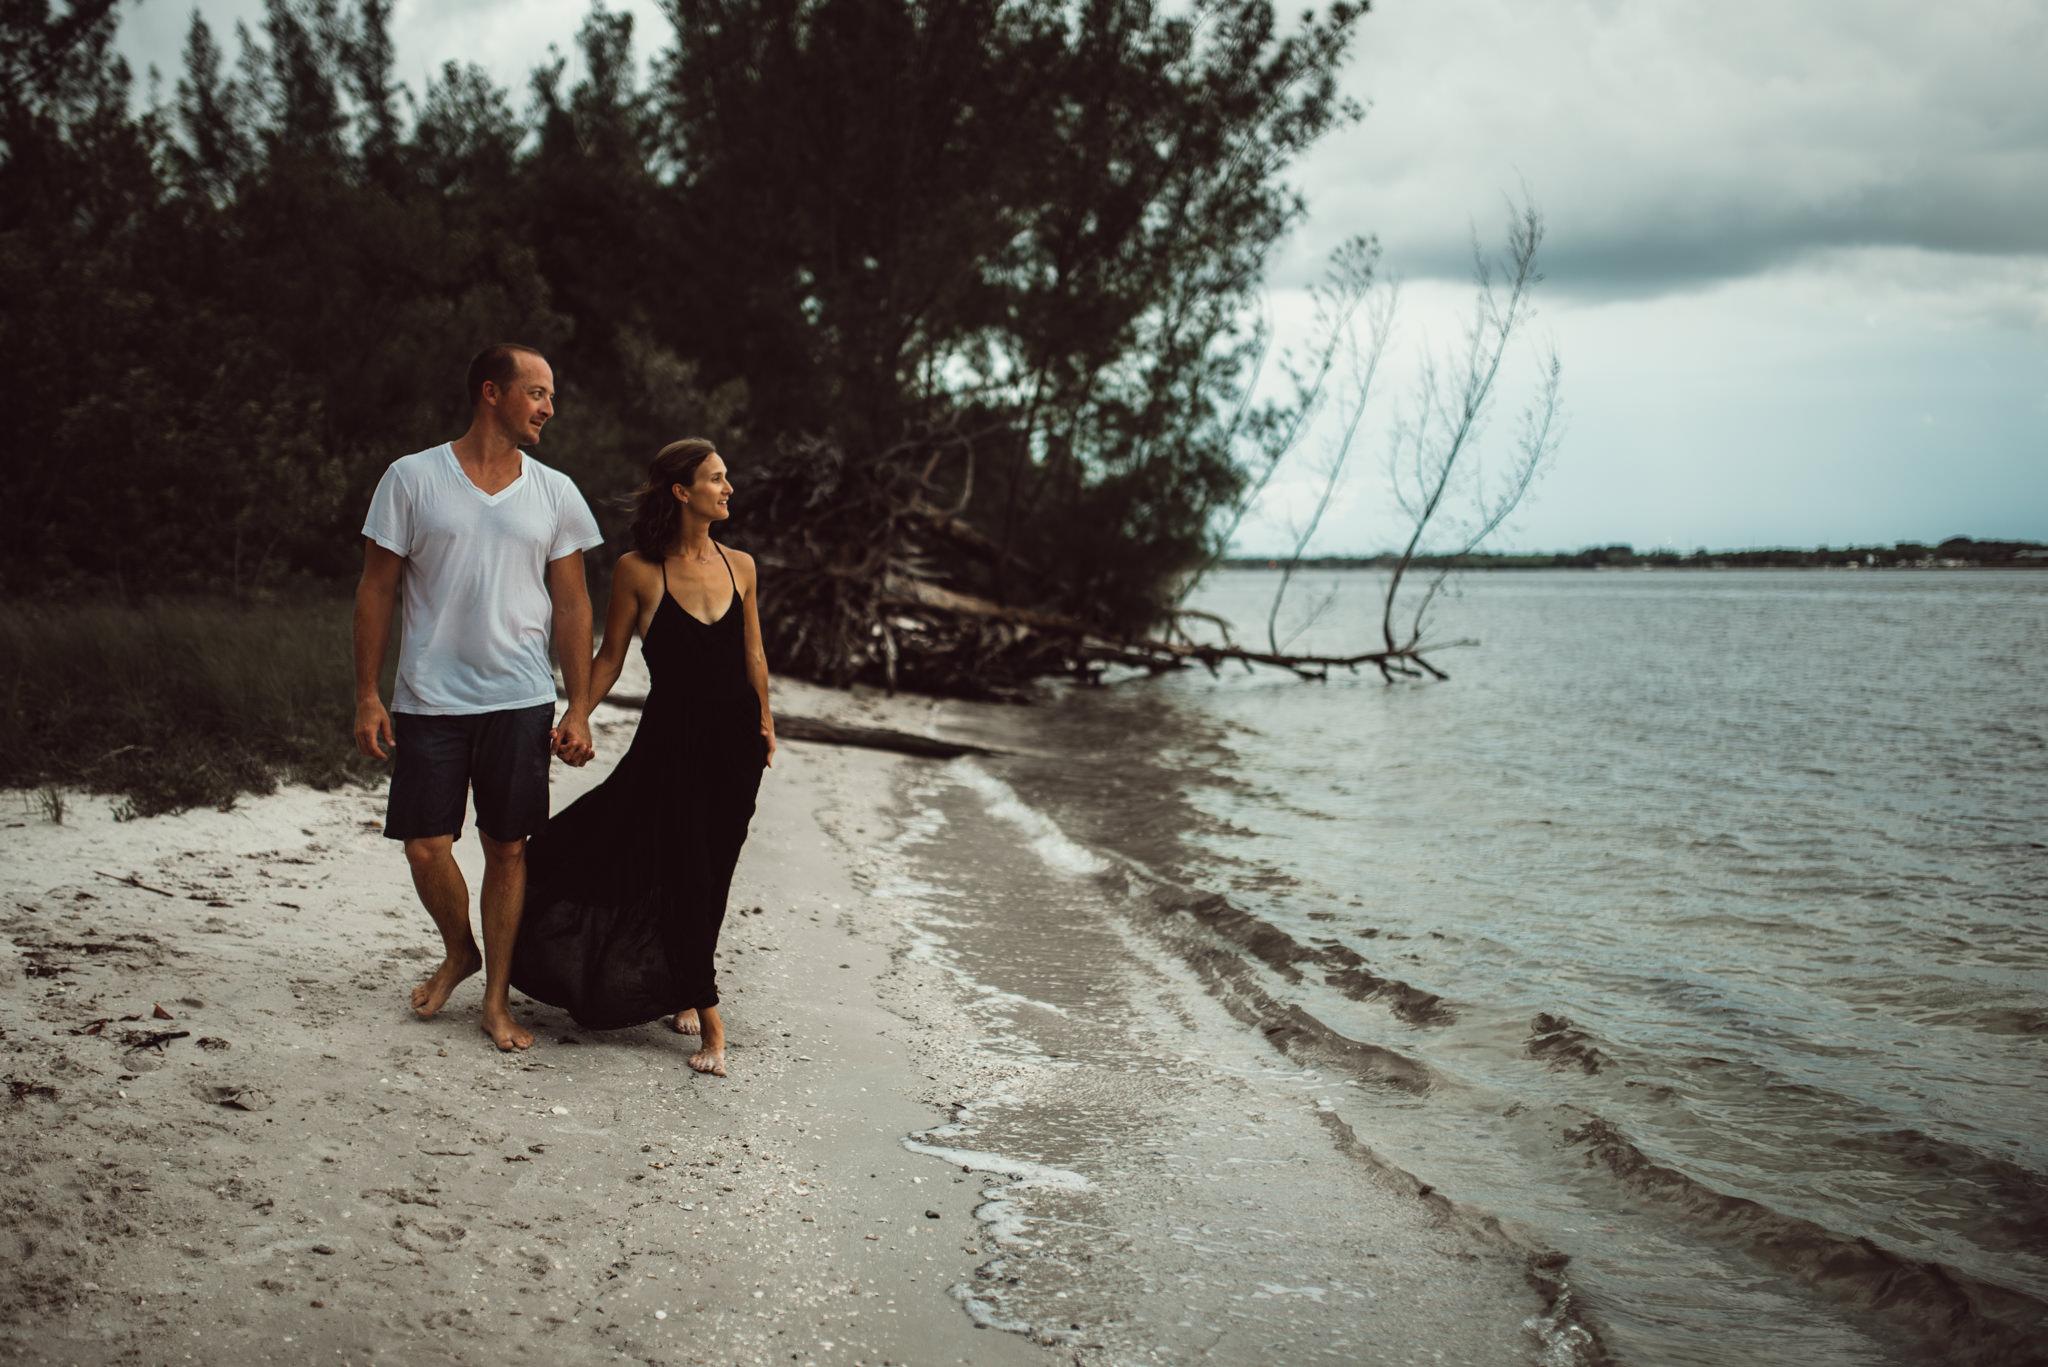 twyla jones photography - treasure coast florida - island family session-5488.jpg